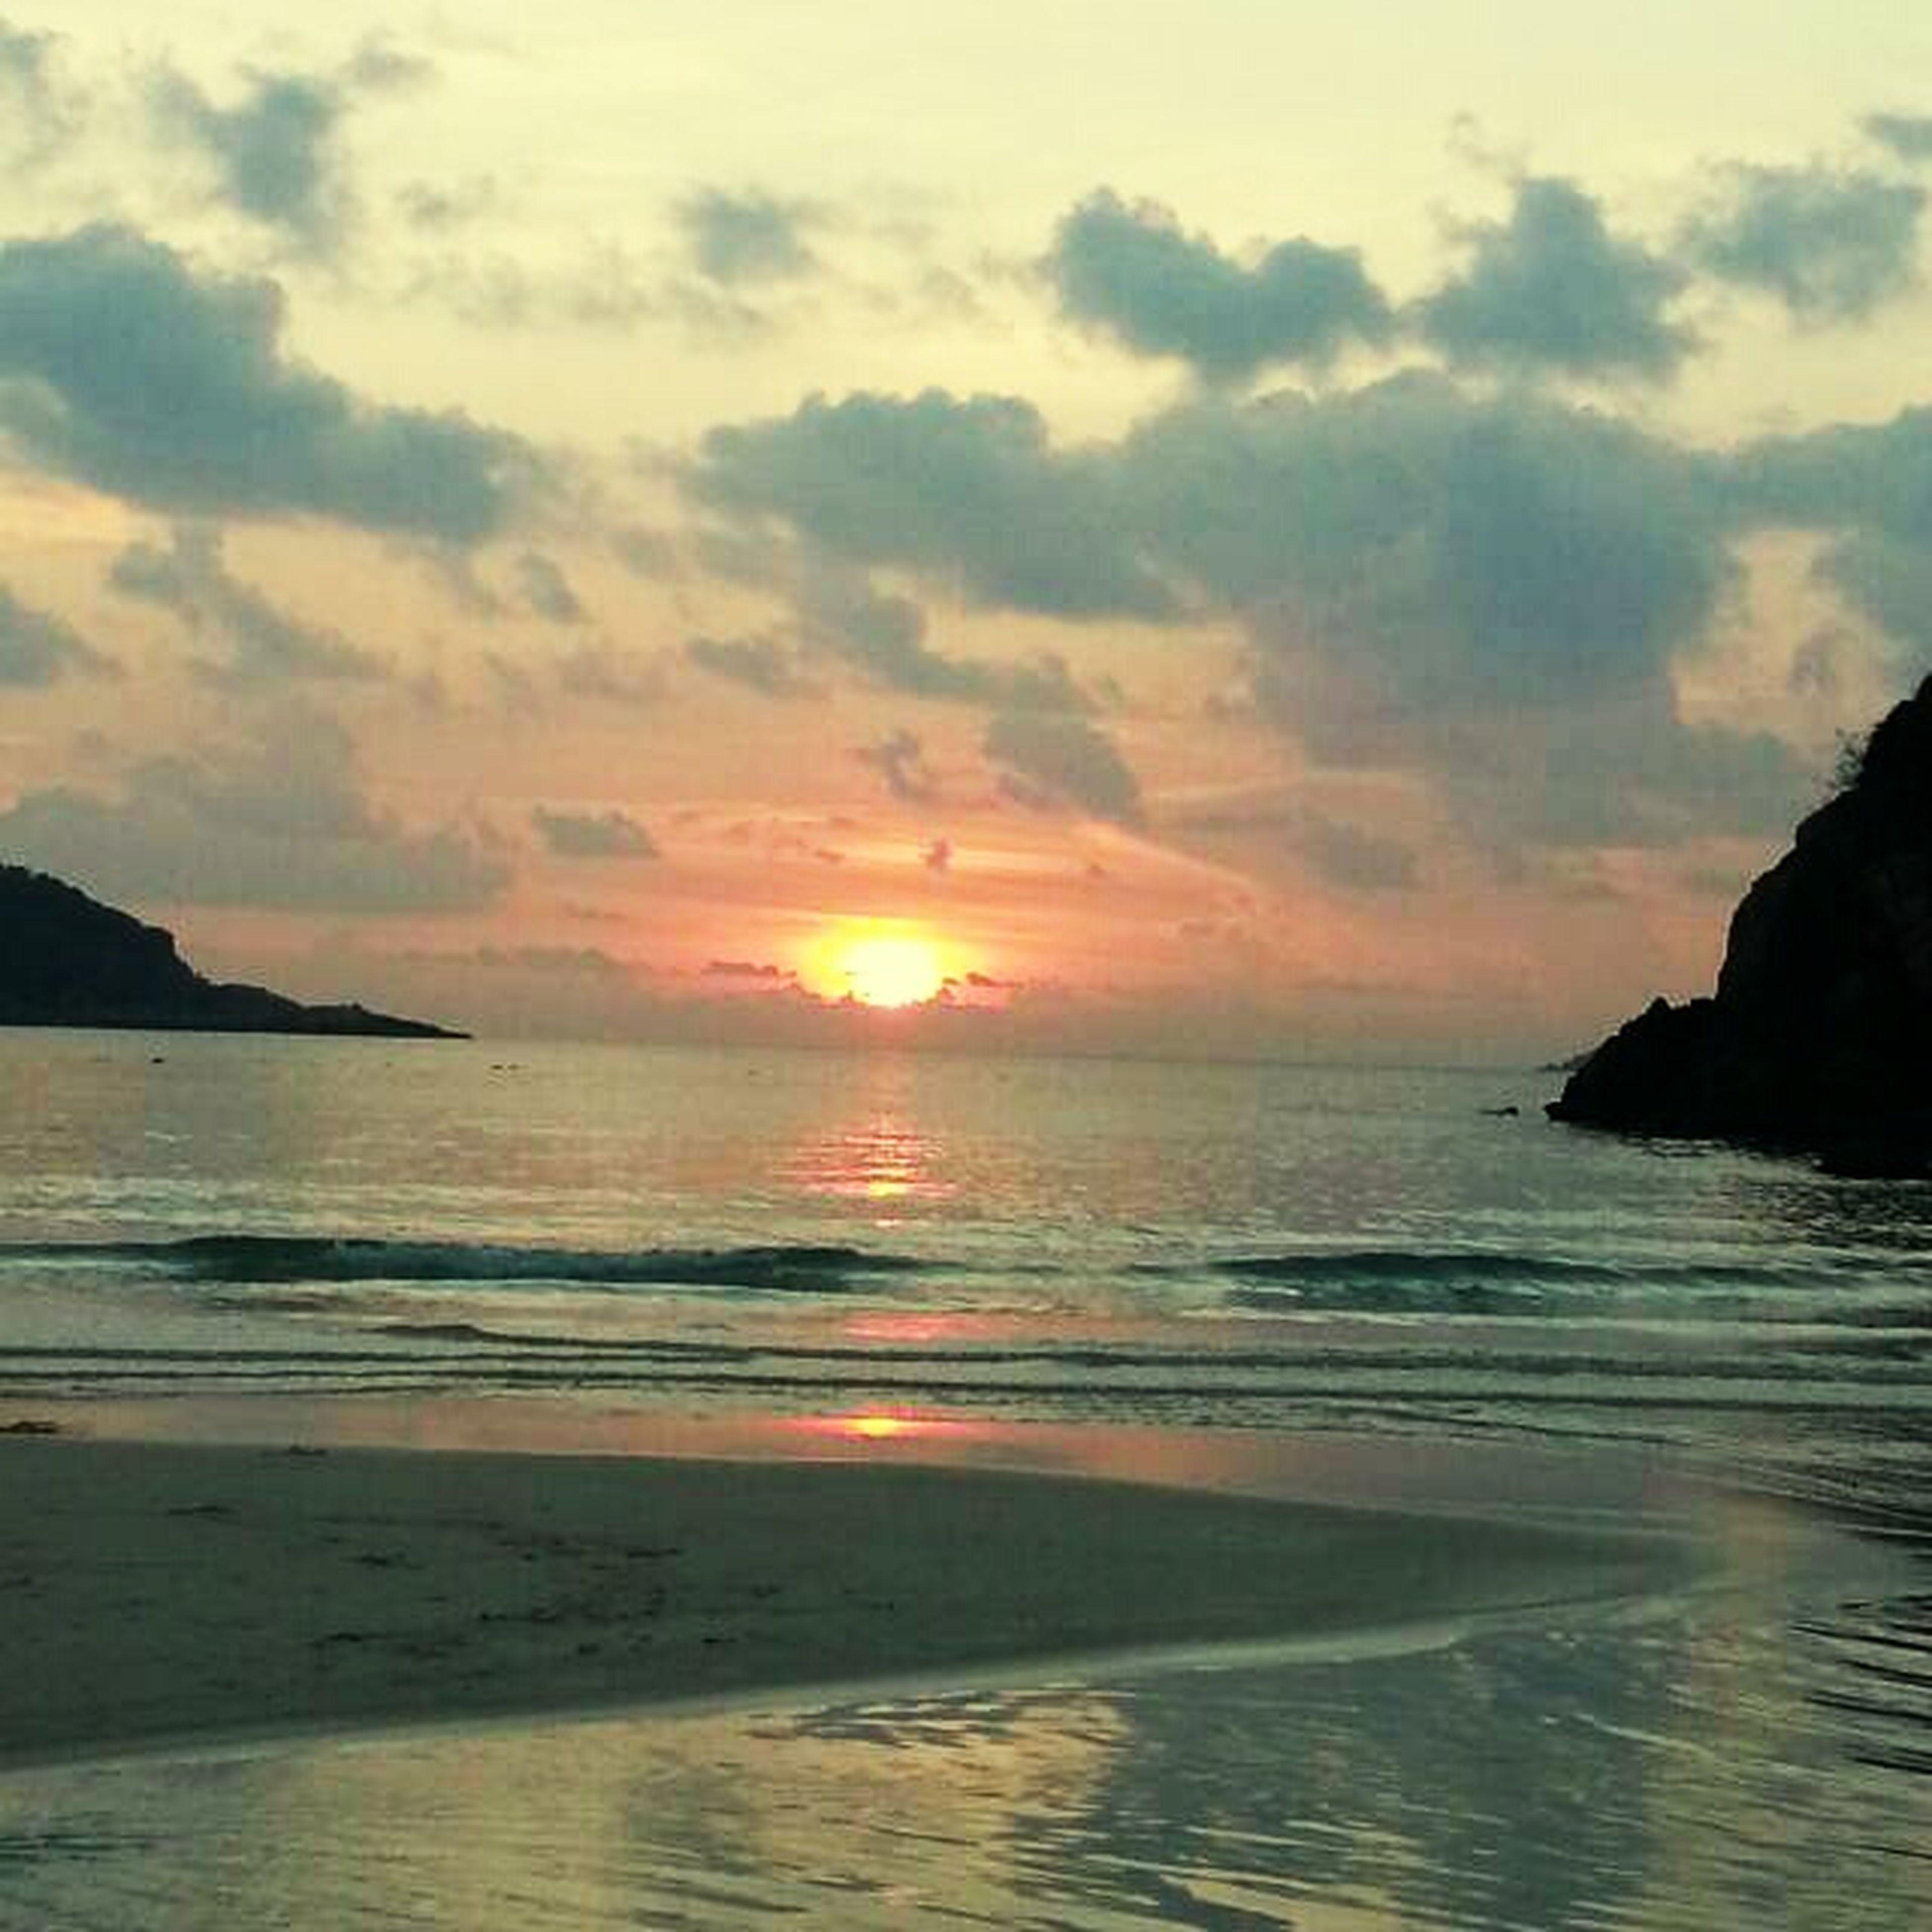 sea, water, horizon over water, sunset, scenics, tranquil scene, beauty in nature, beach, tranquility, sky, shore, sun, idyllic, nature, reflection, coastline, wave, cloud - sky, rock - object, orange color